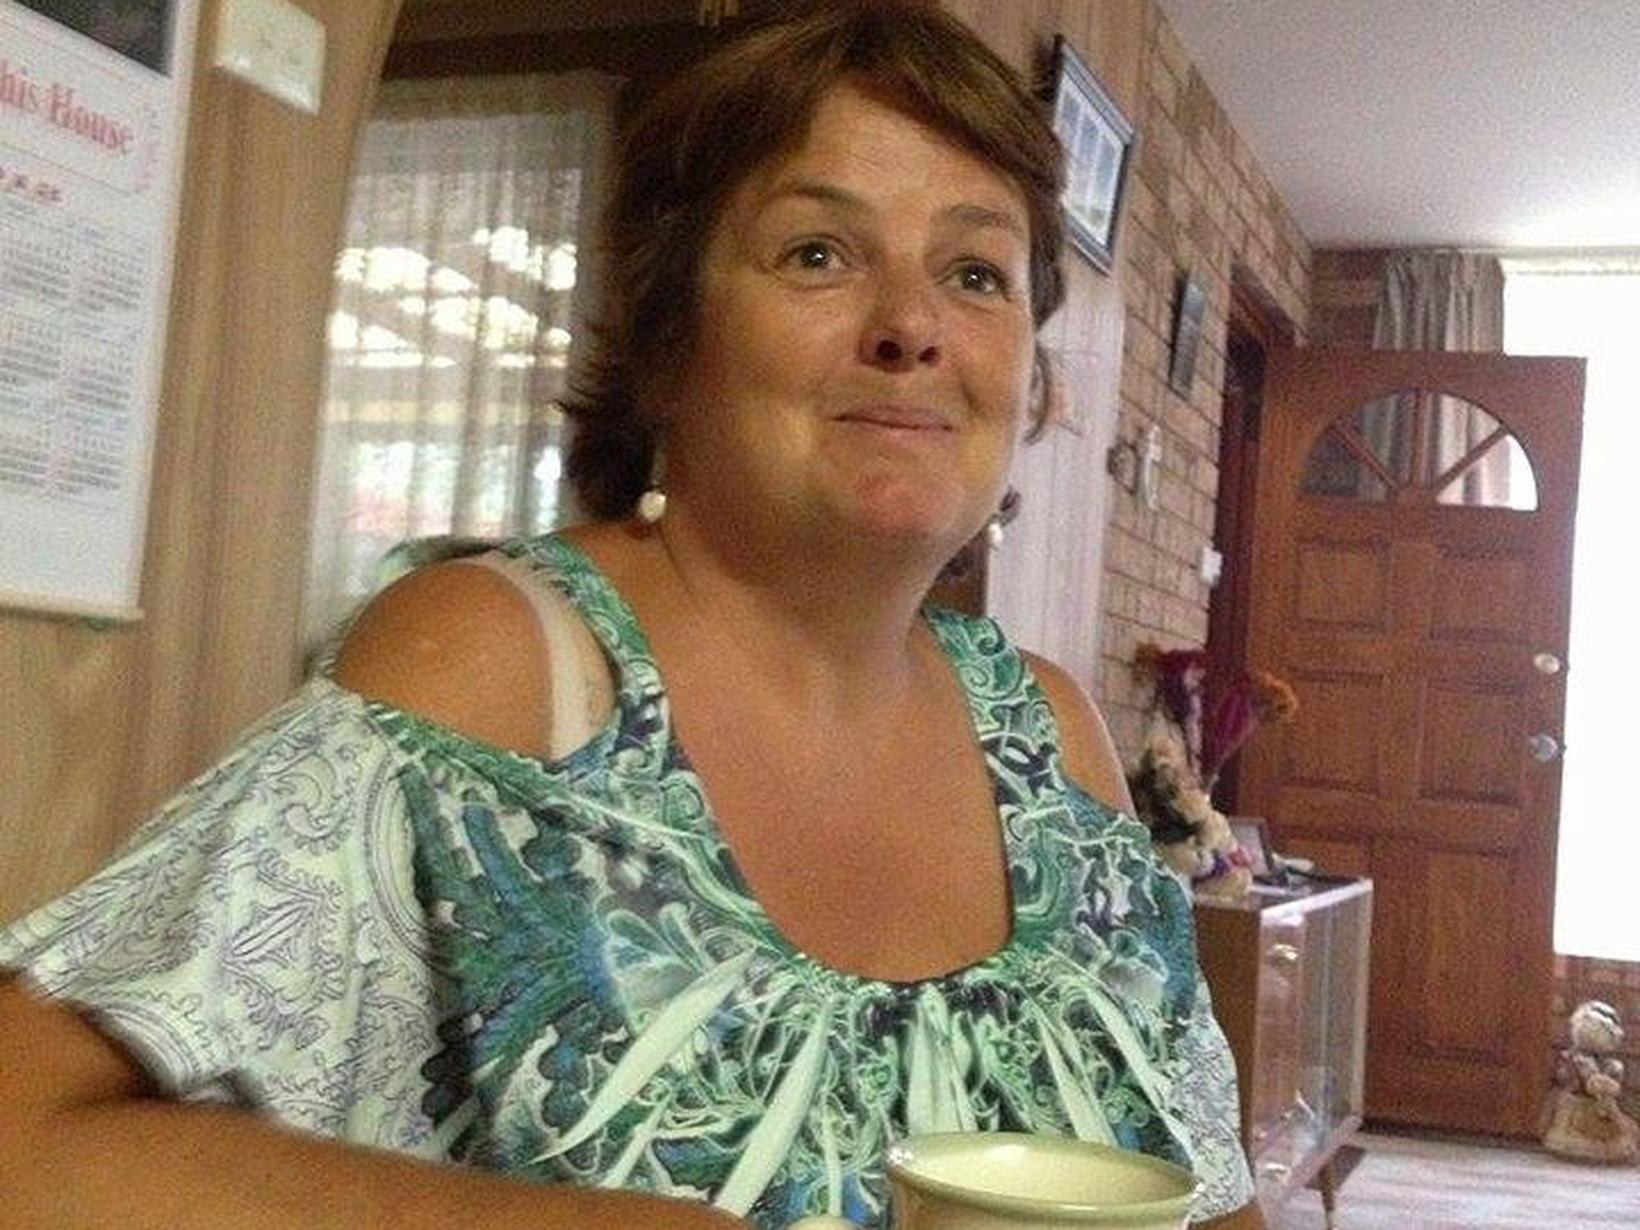 Carol from Toronto, Ontario, Canada